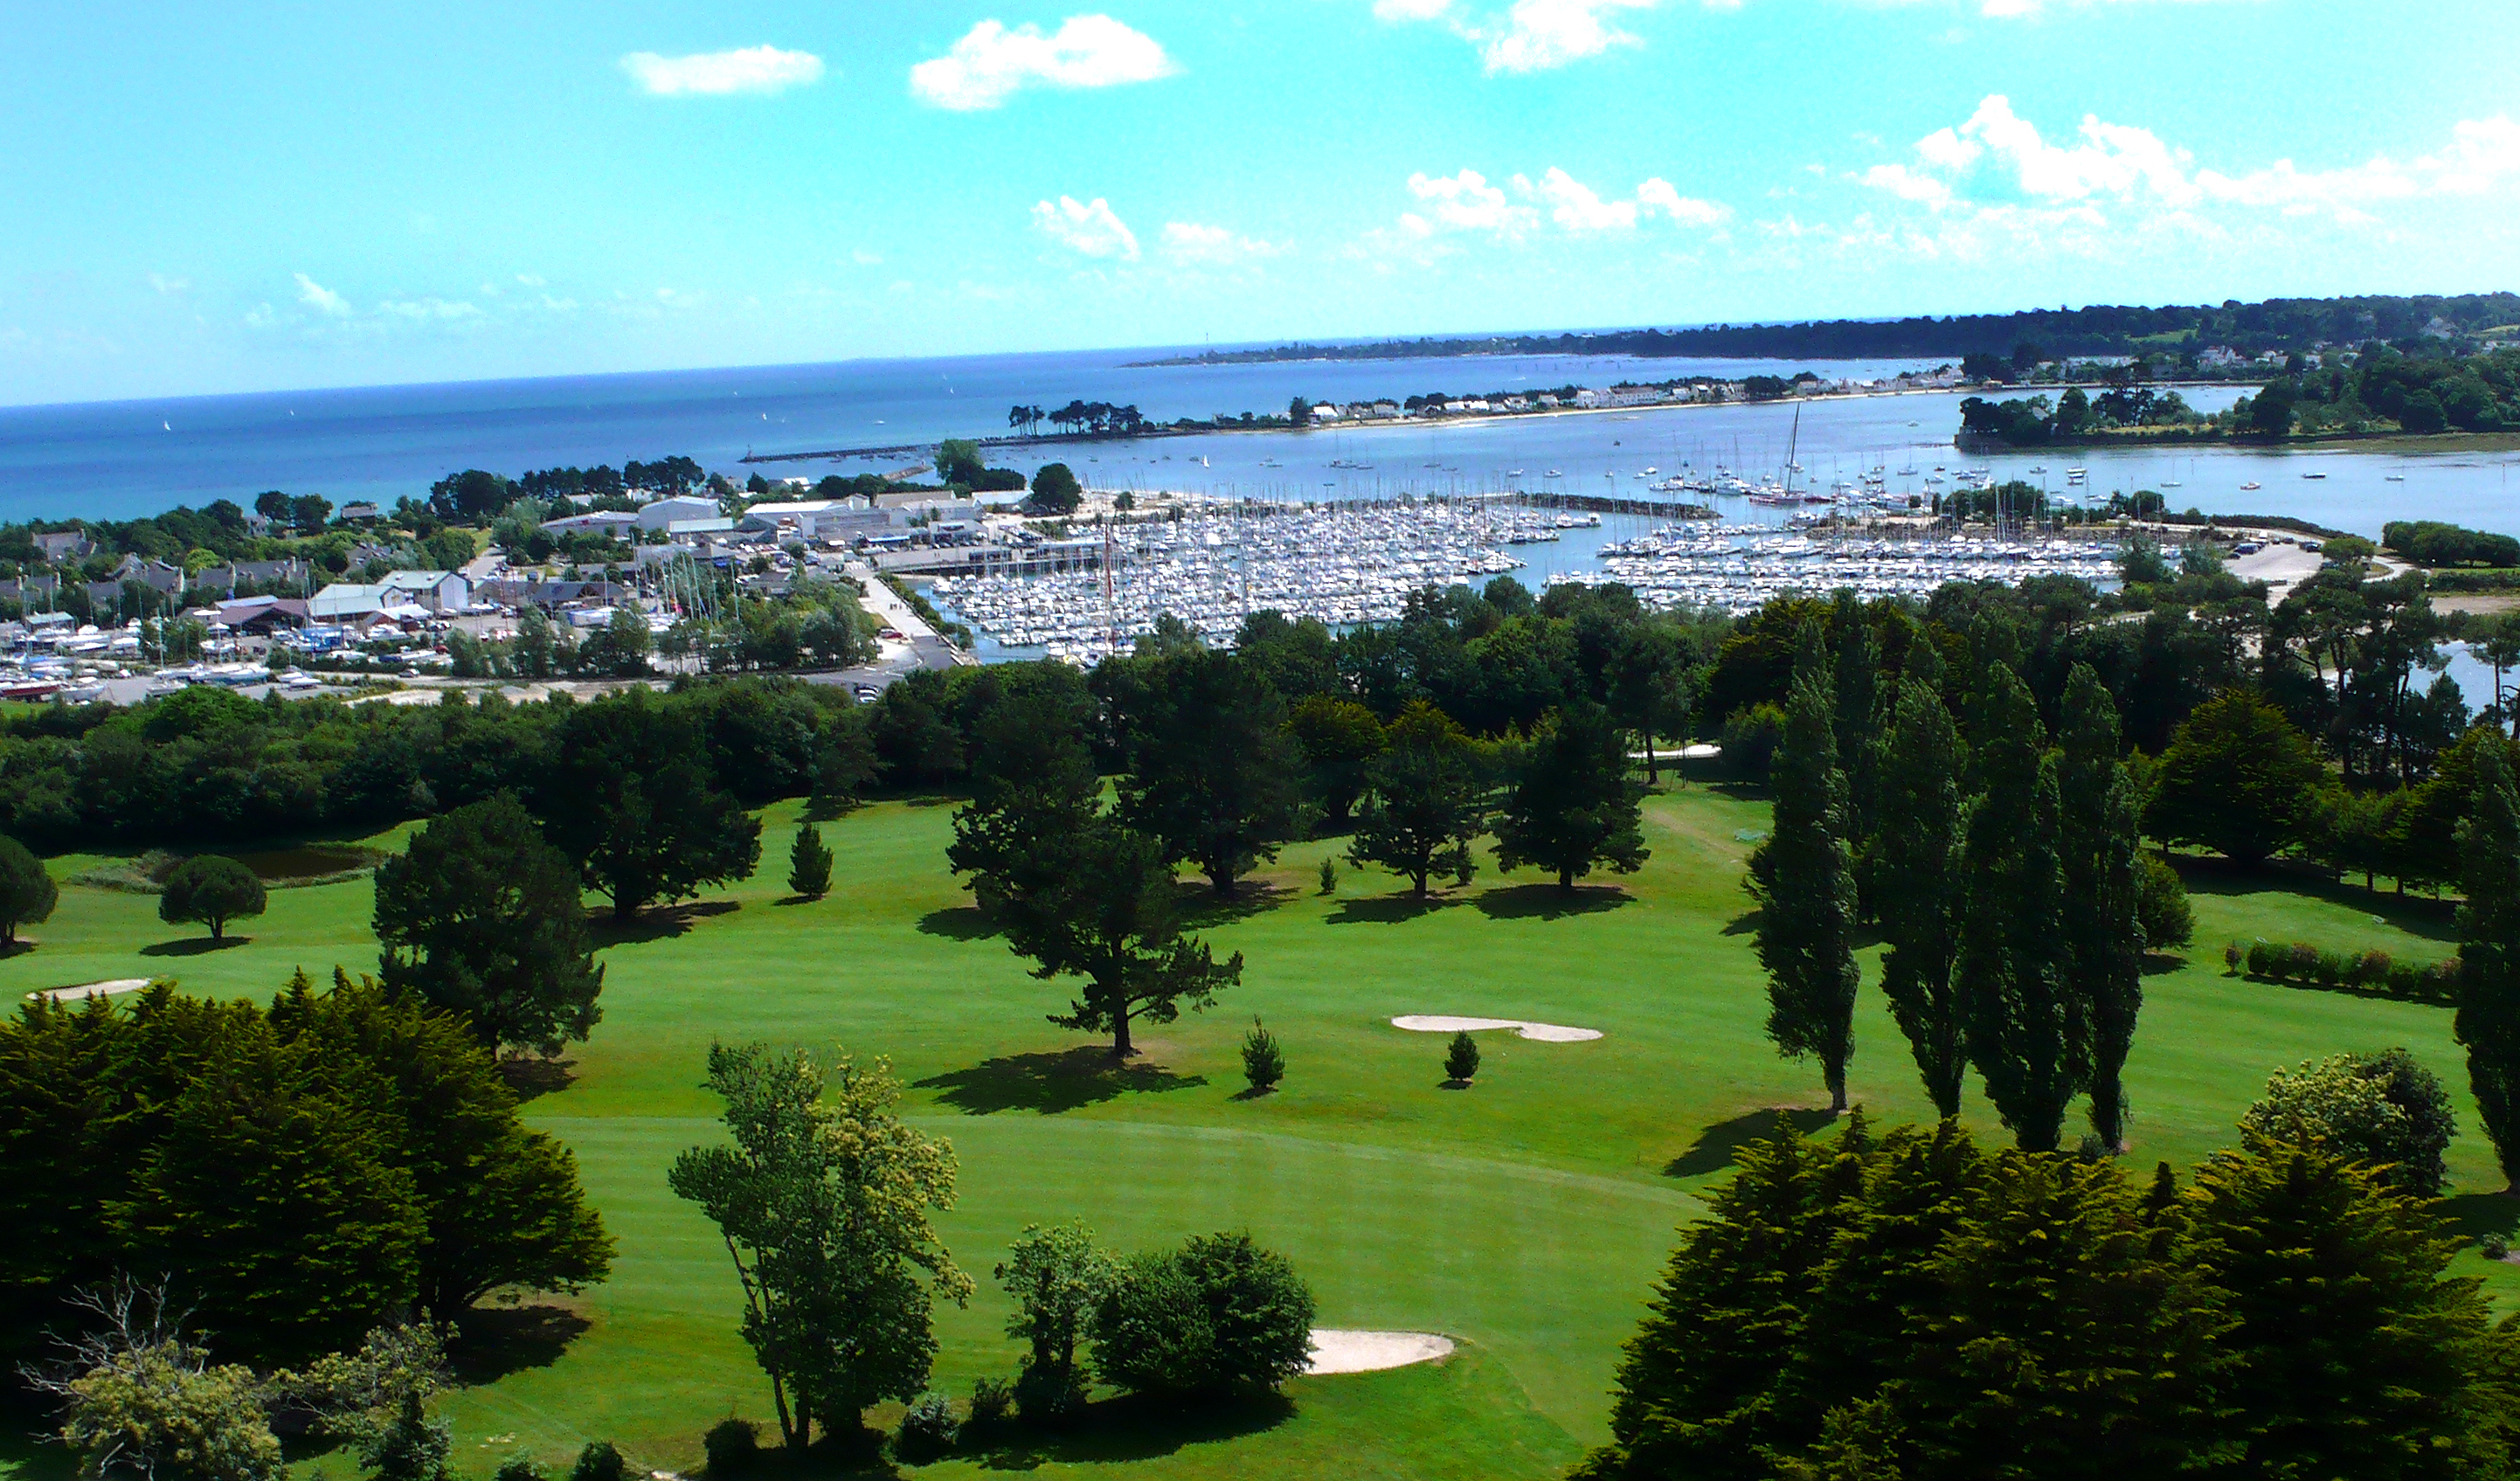 Initiation gratuite de golf – ANNULEE